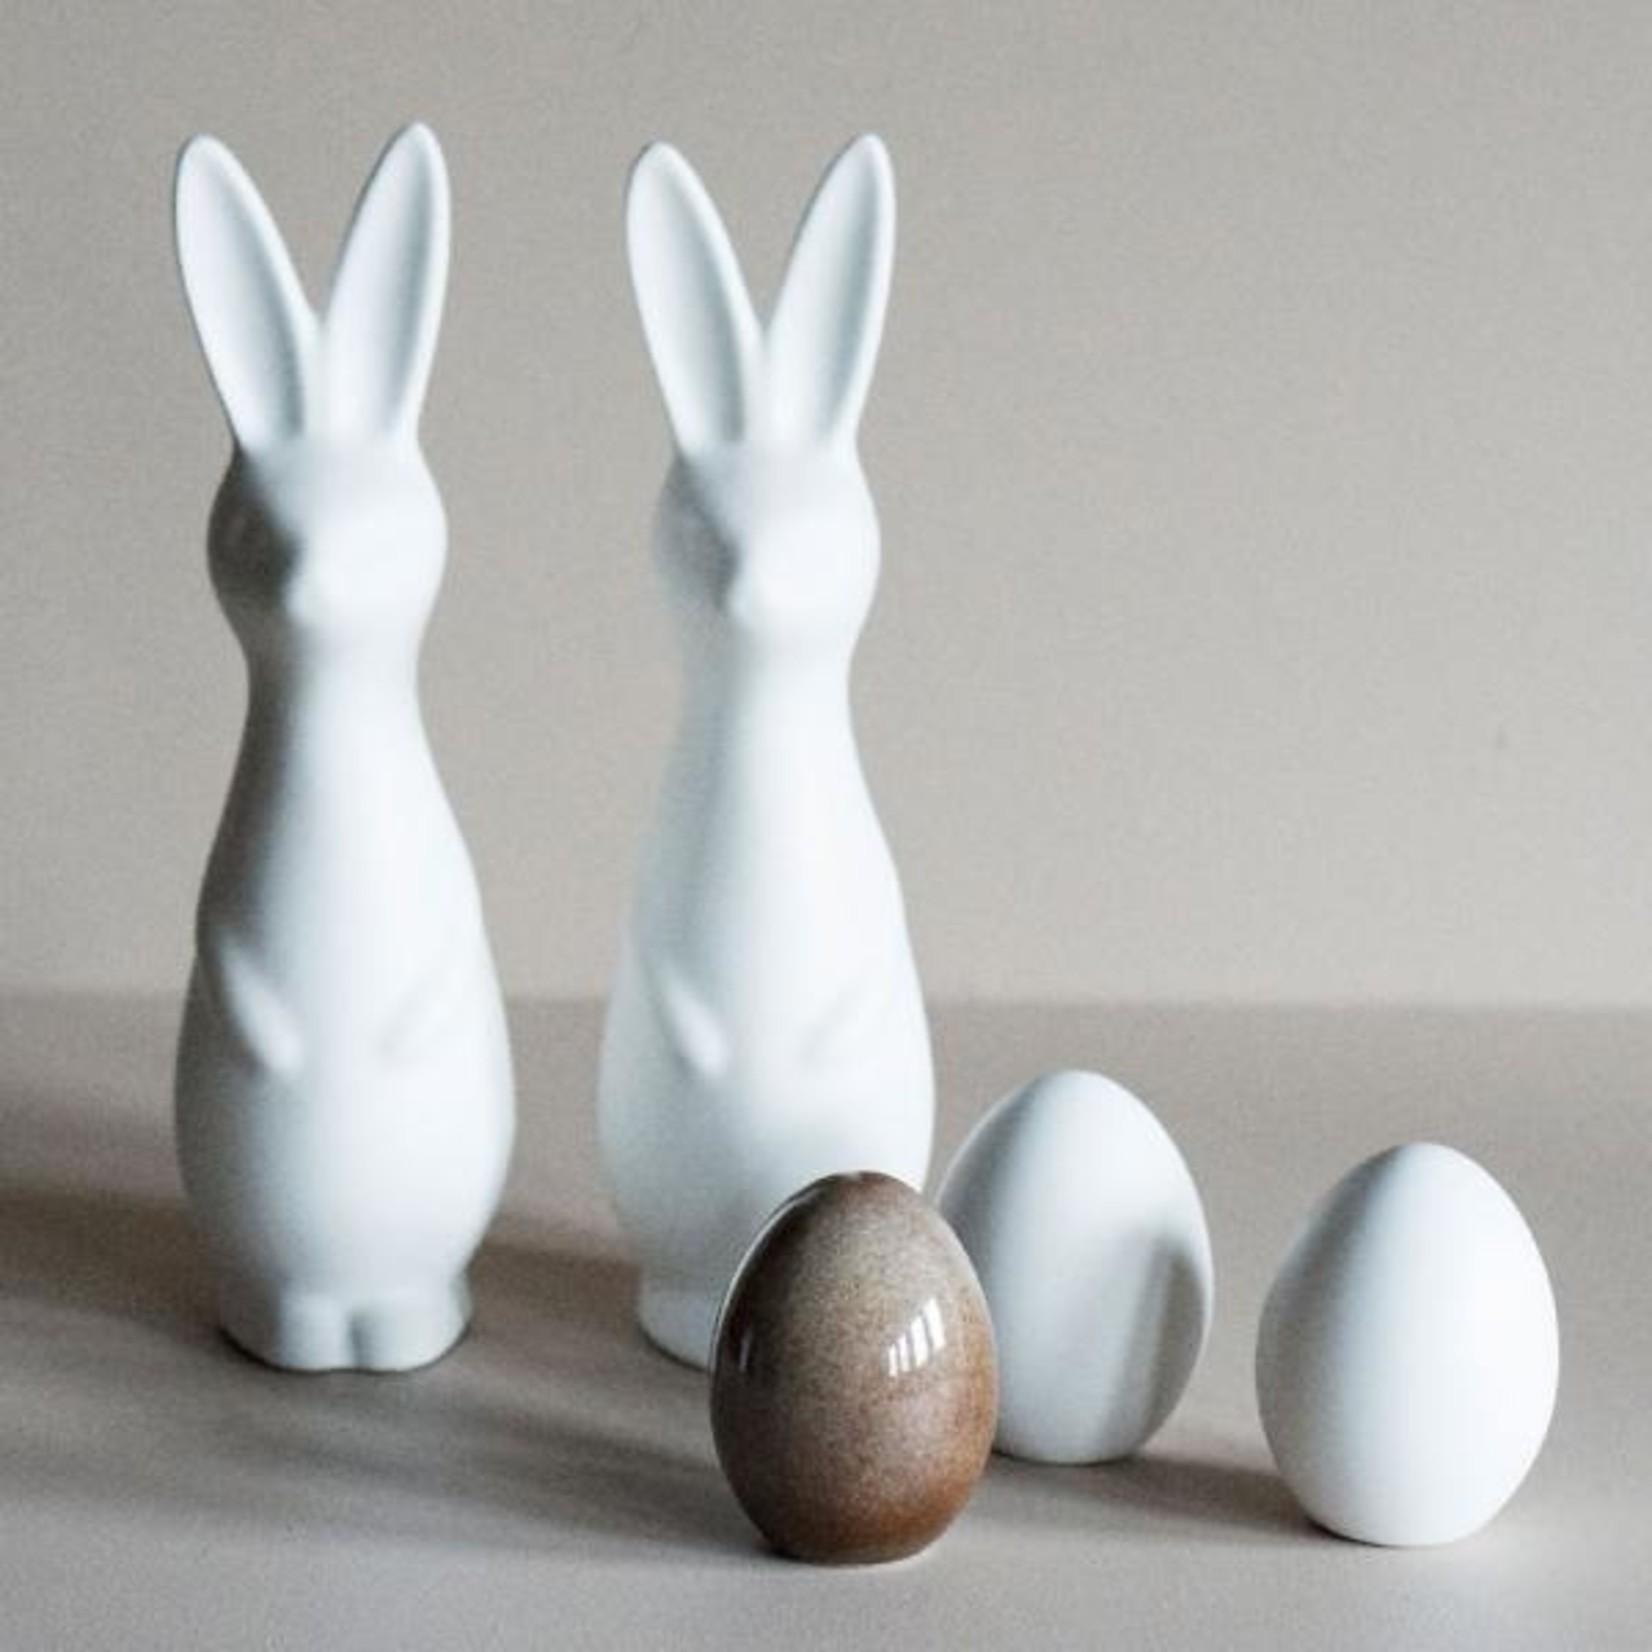 DBKD Standing Egg white